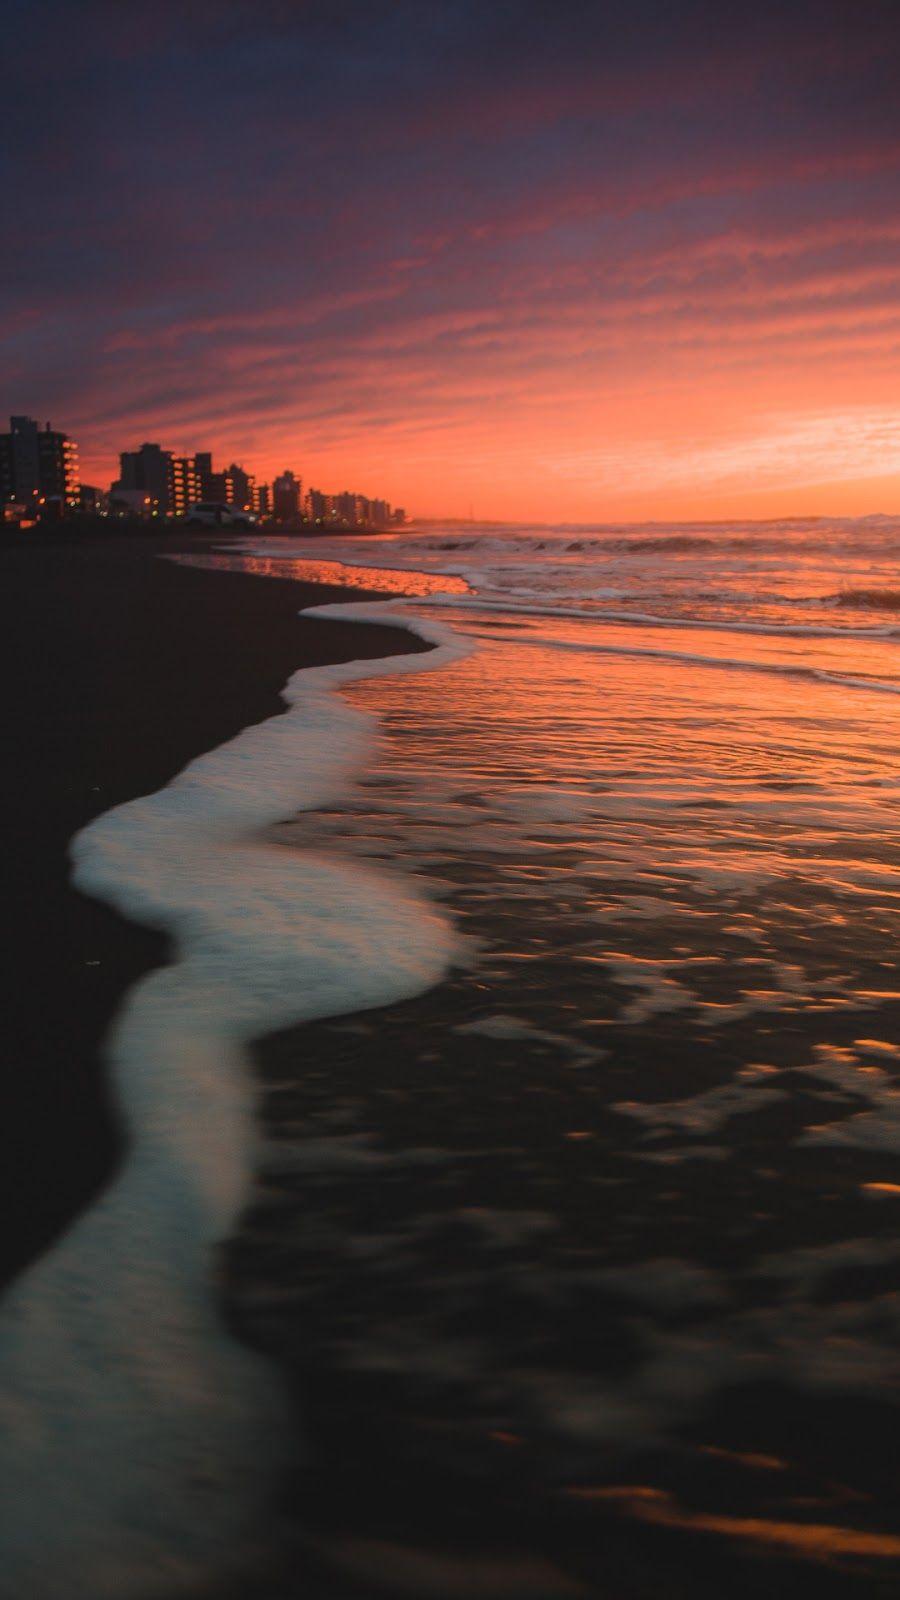 Sunset Beach Wallpaper Beach Wallpaper Sunset Wallpaper Beach Wallpaper Iphone